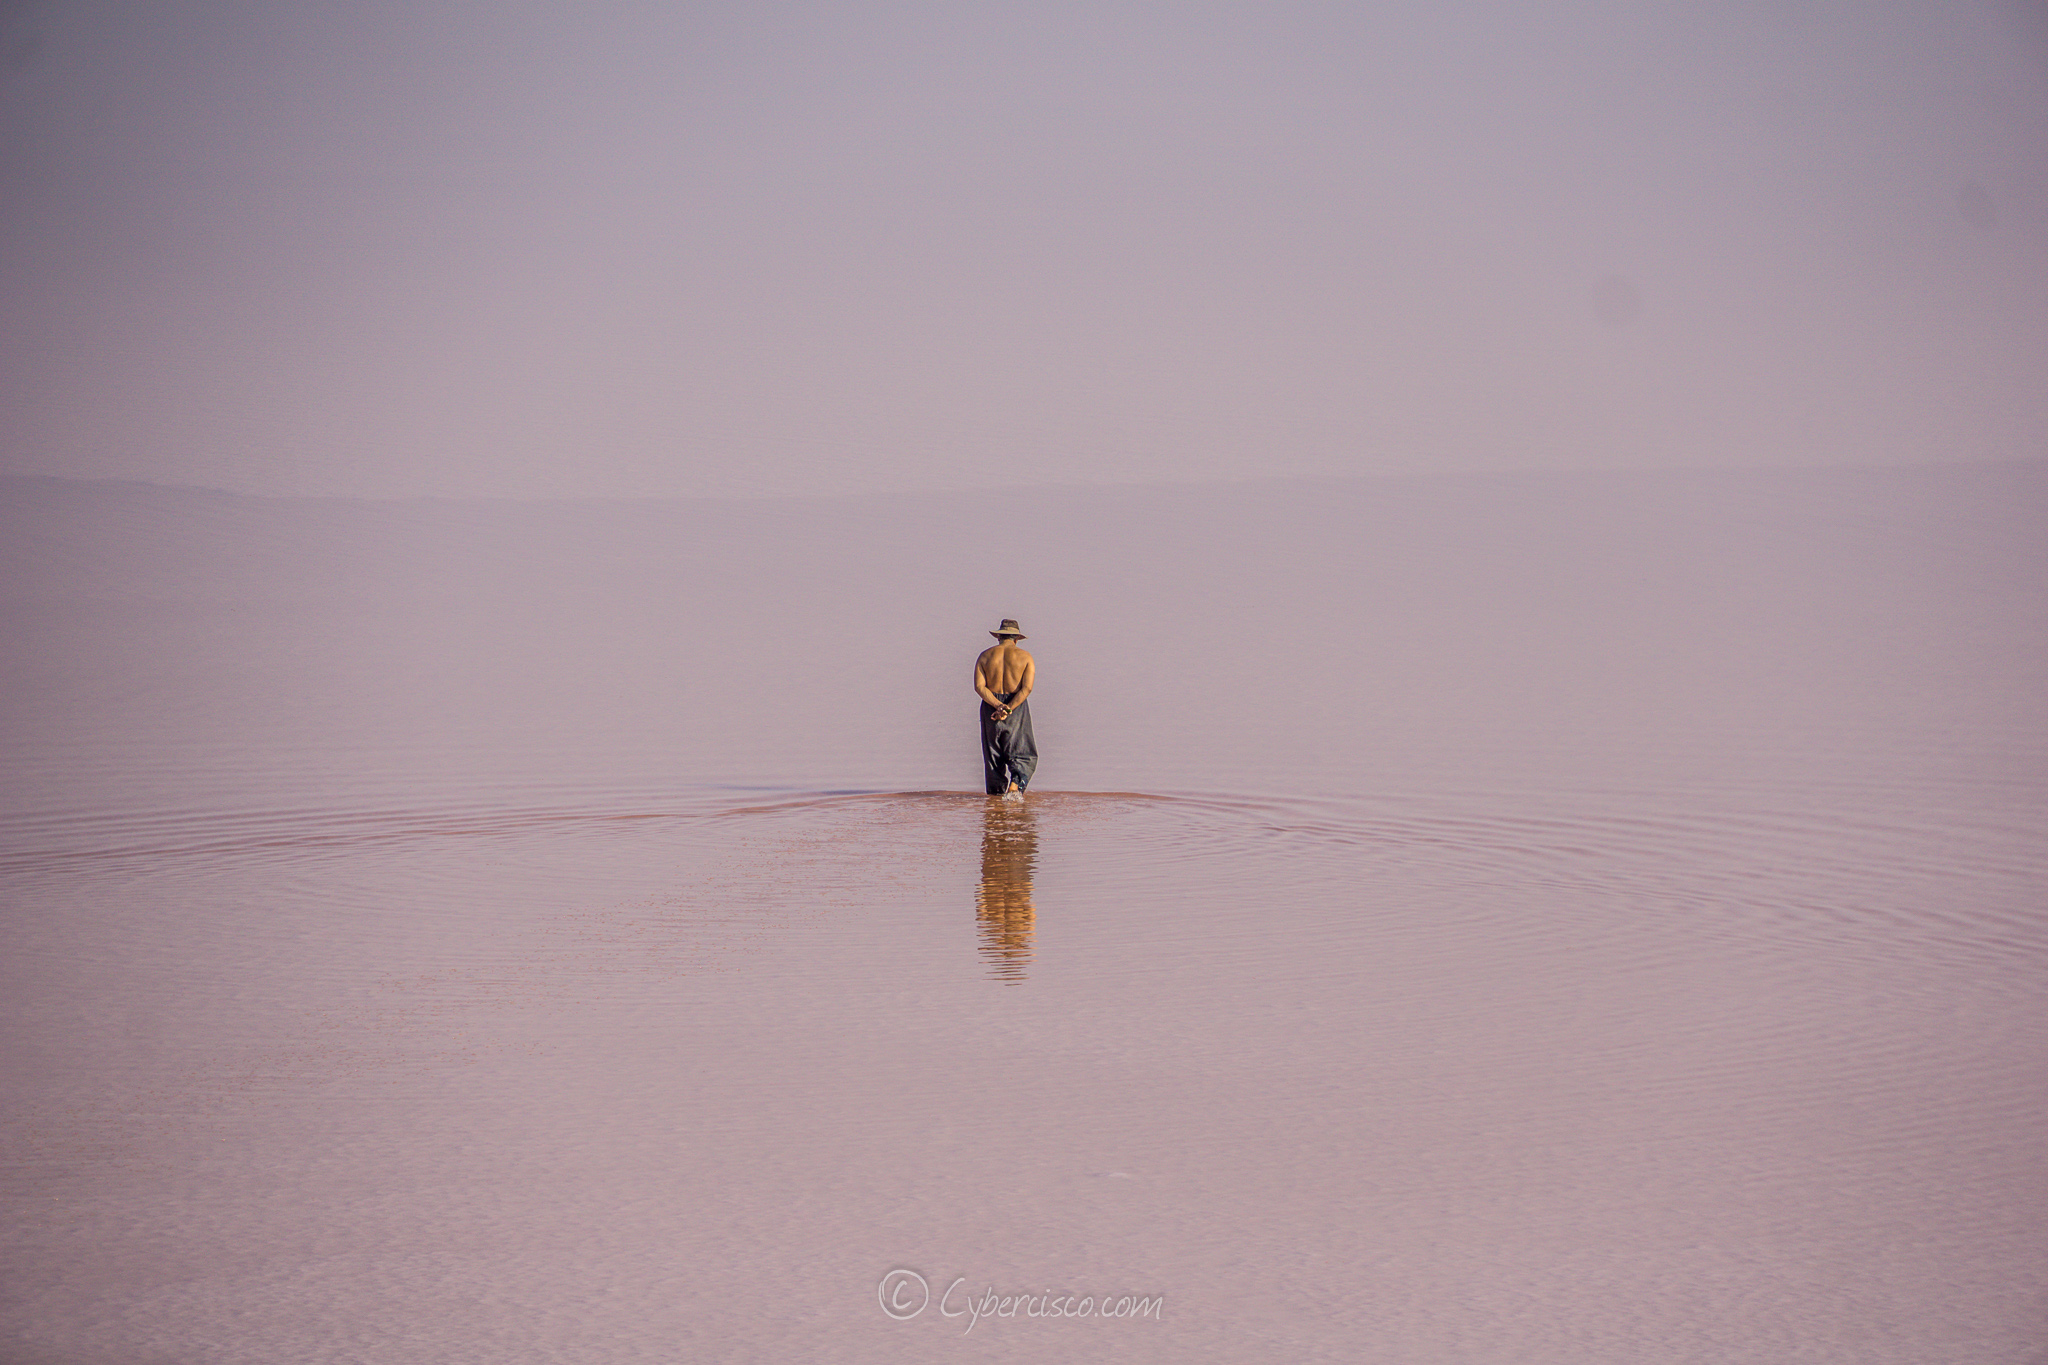 Salt lake stroll, Iran